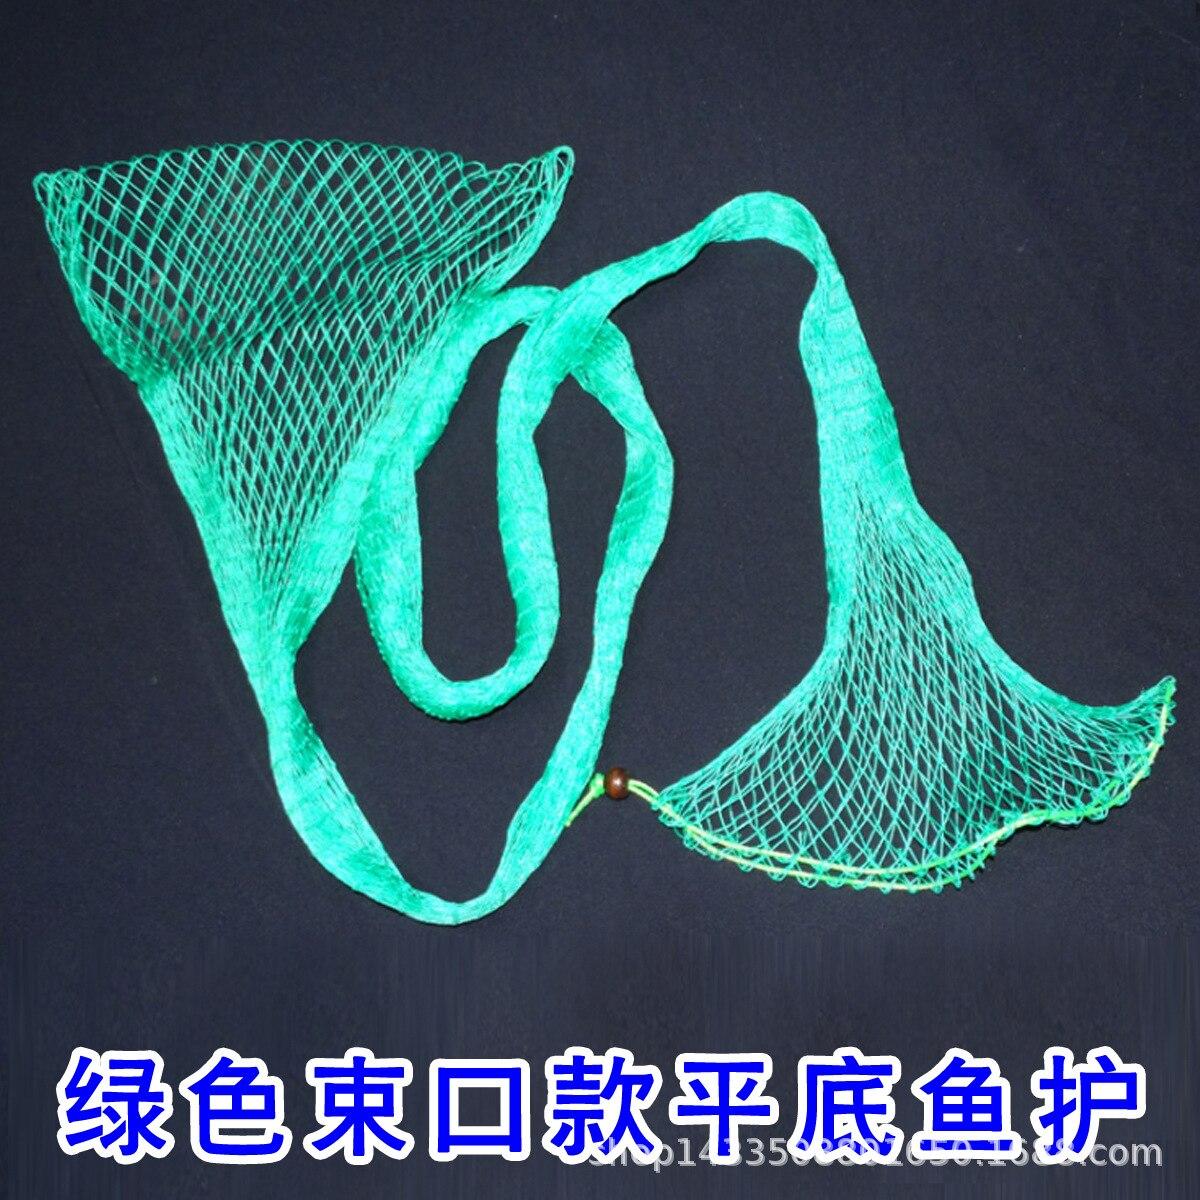 18 Unit Simplicity Flat Drawstring Top Fish Basket Rough Line Bigeye Brand New Material Glue Silk Ribbon String Bag Fishing Gear